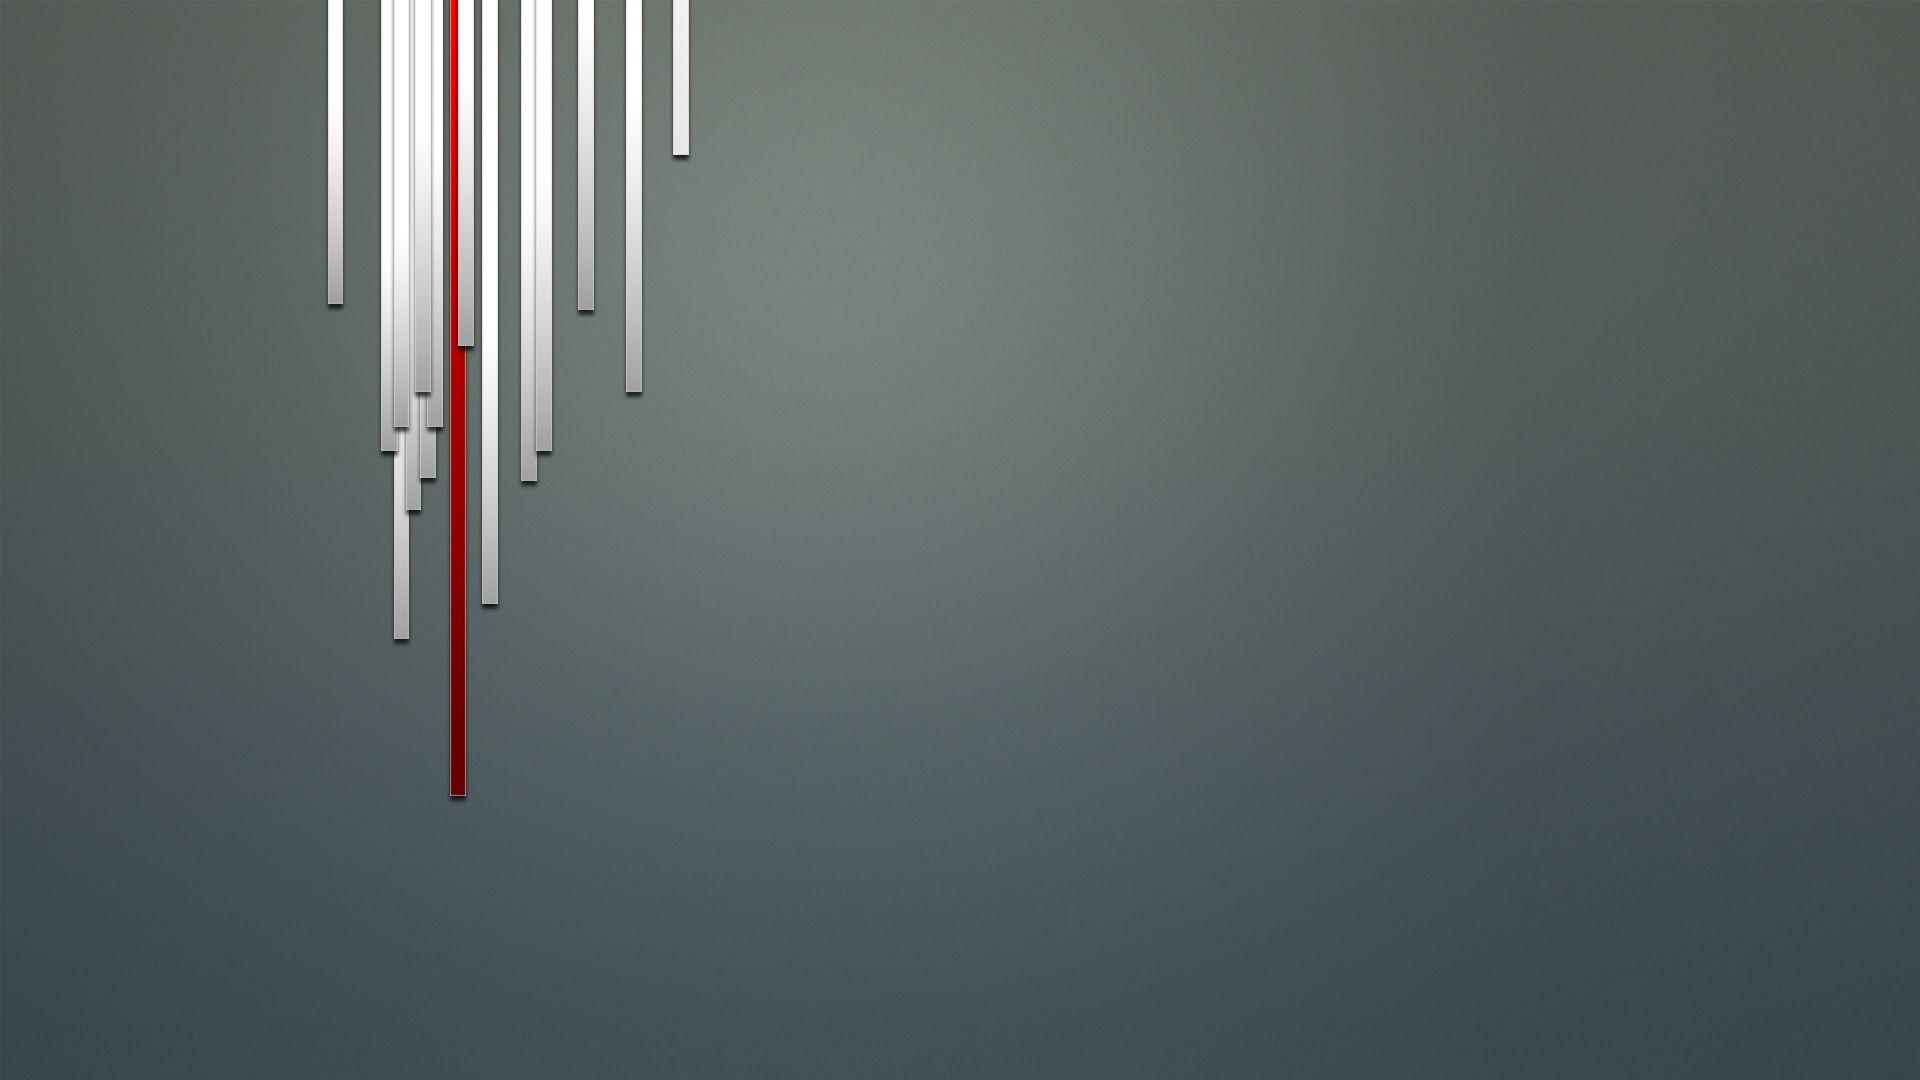 Oppo 3d Wallpaper Grey Abstract Wallpaper 03 1920x1080